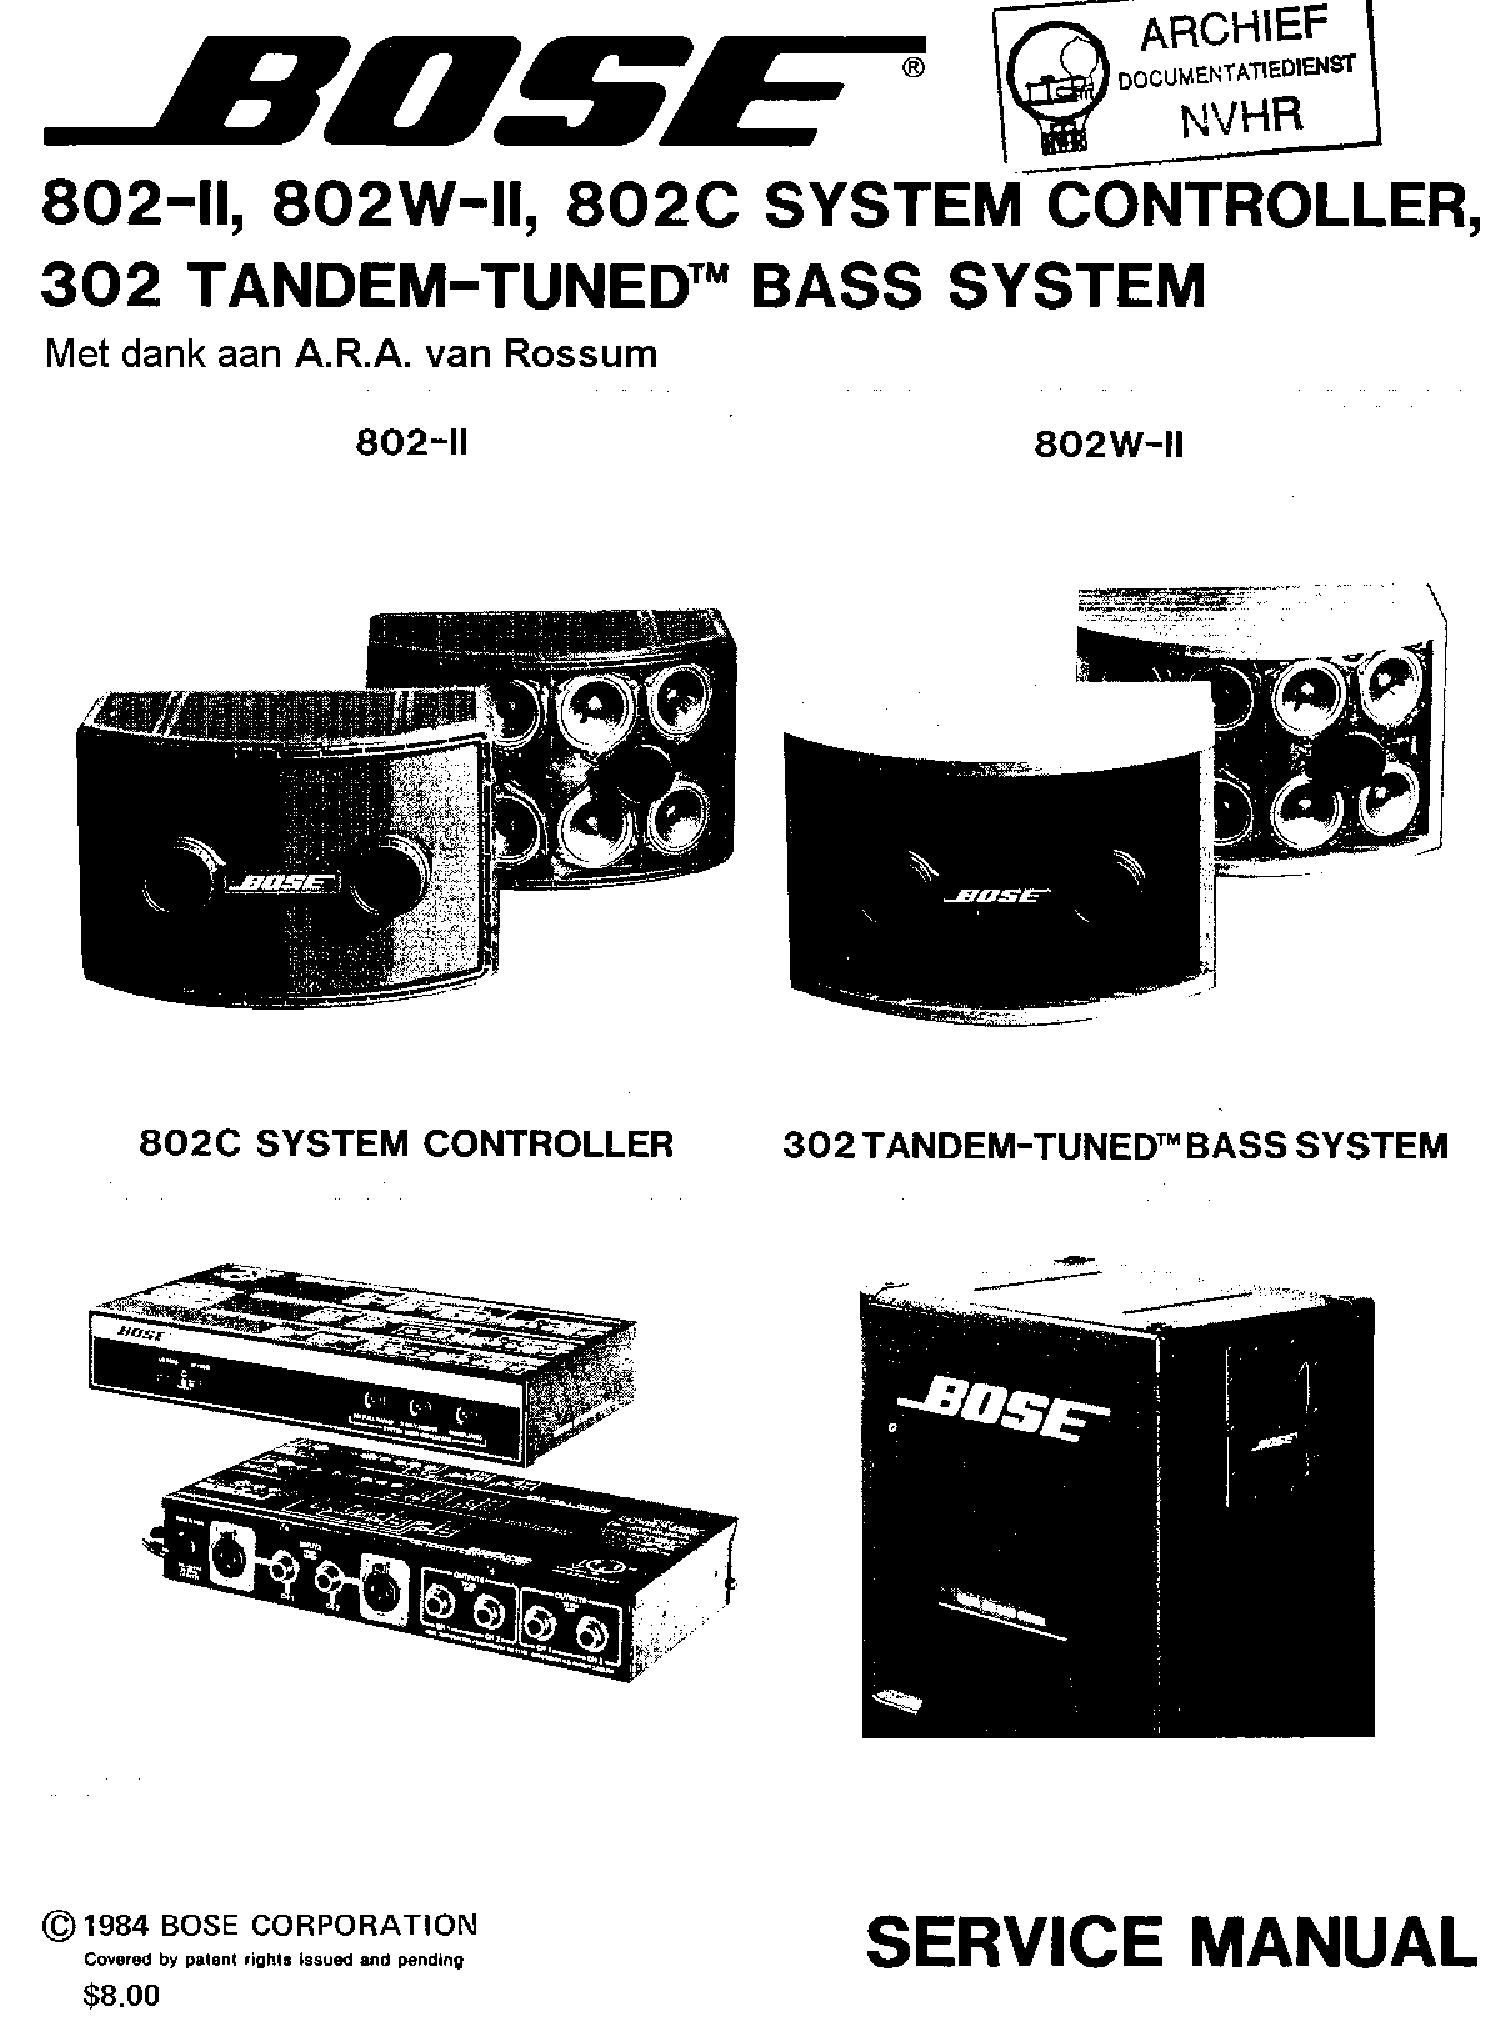 Bose 802 Ii 802w Ii 802c System Controller 302 Tandem